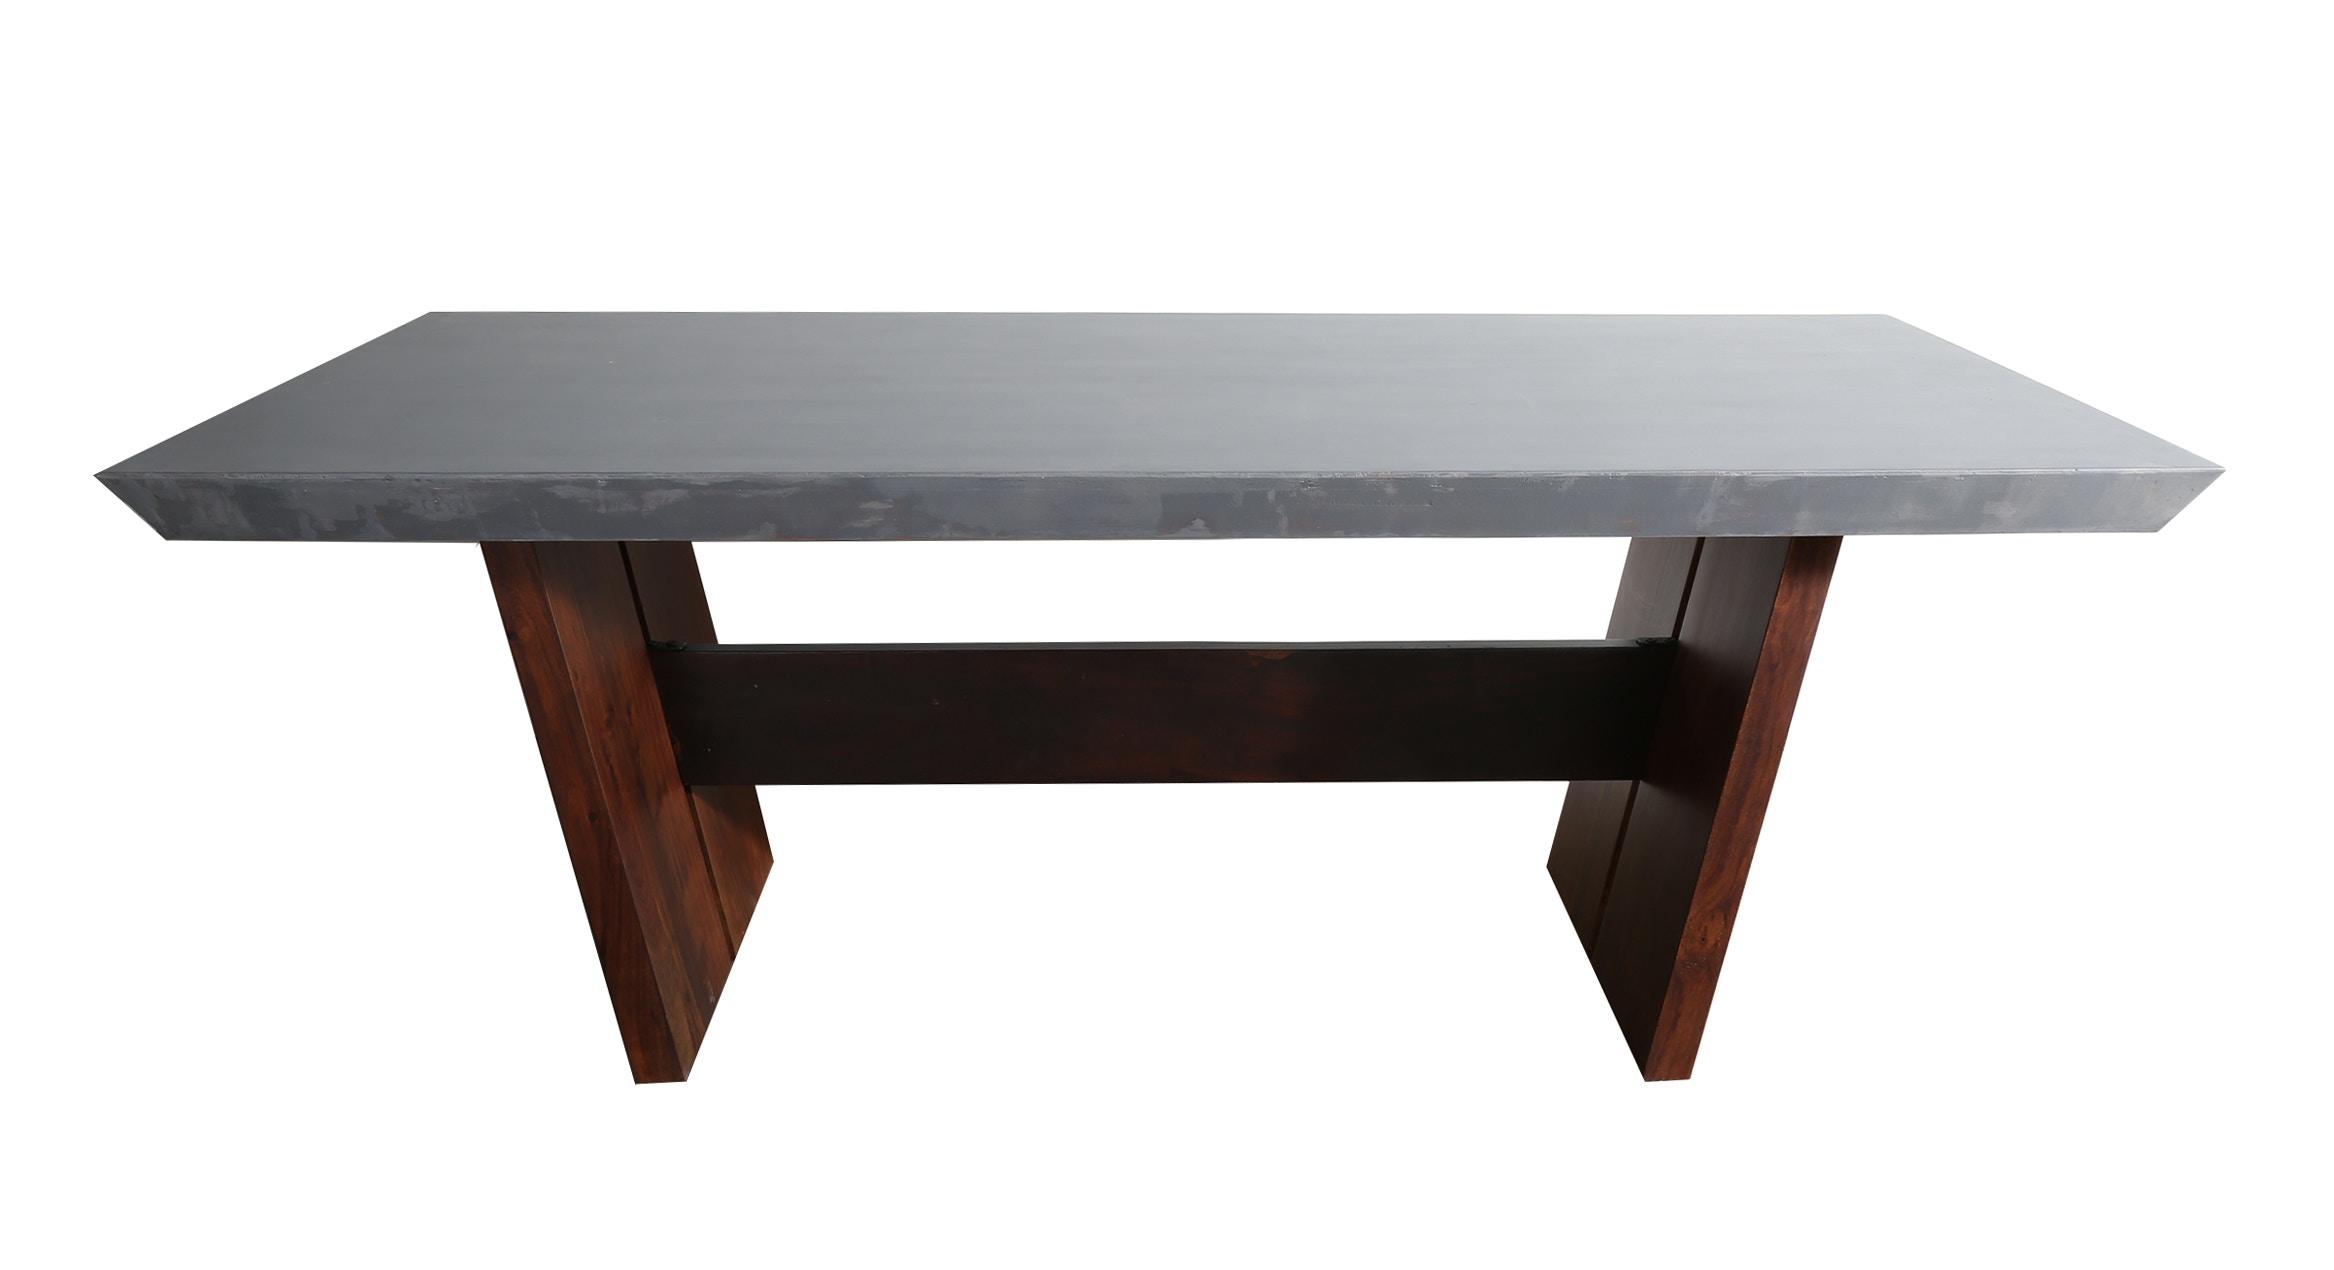 Stock Program BOLTON CONCRETE DINING TABLE DEN15031ST From Walter E. Smithe  Furniture + Design